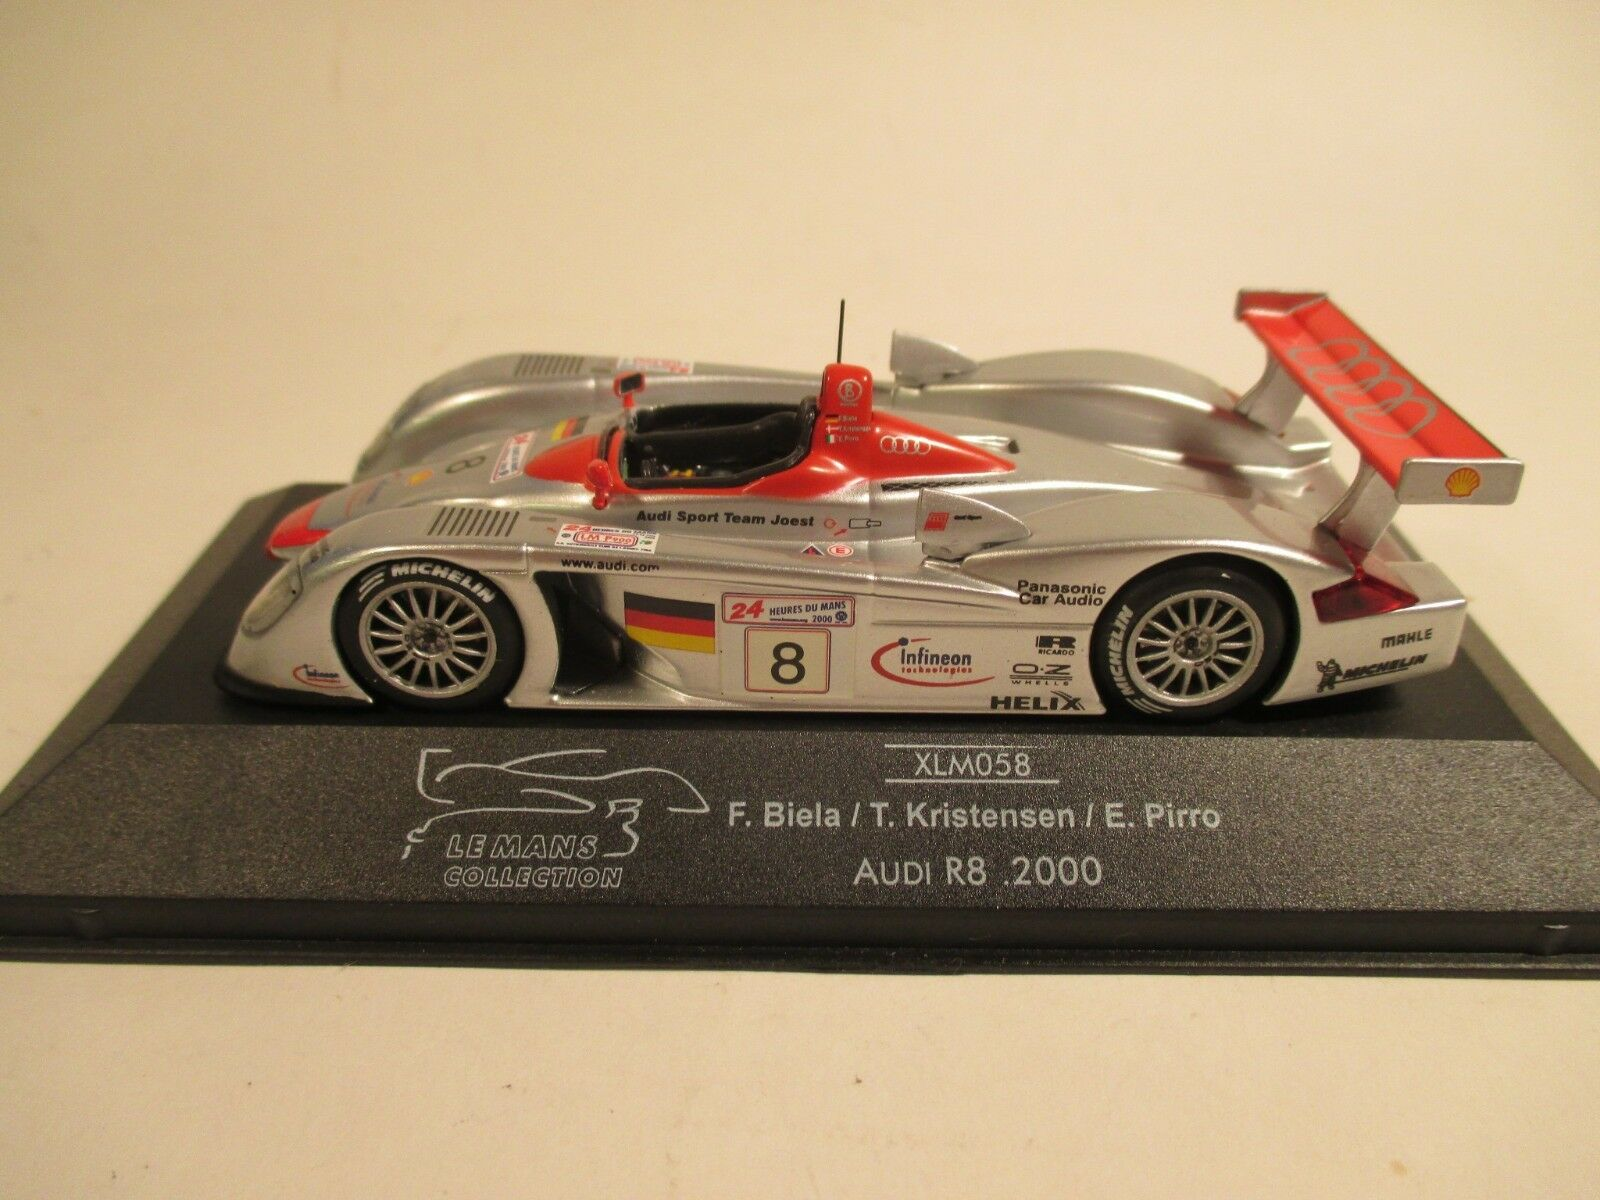 Onyx XLM058 Audi R8 Le Mans 2000 Biela Kristensen Pirro 1 43 MIB